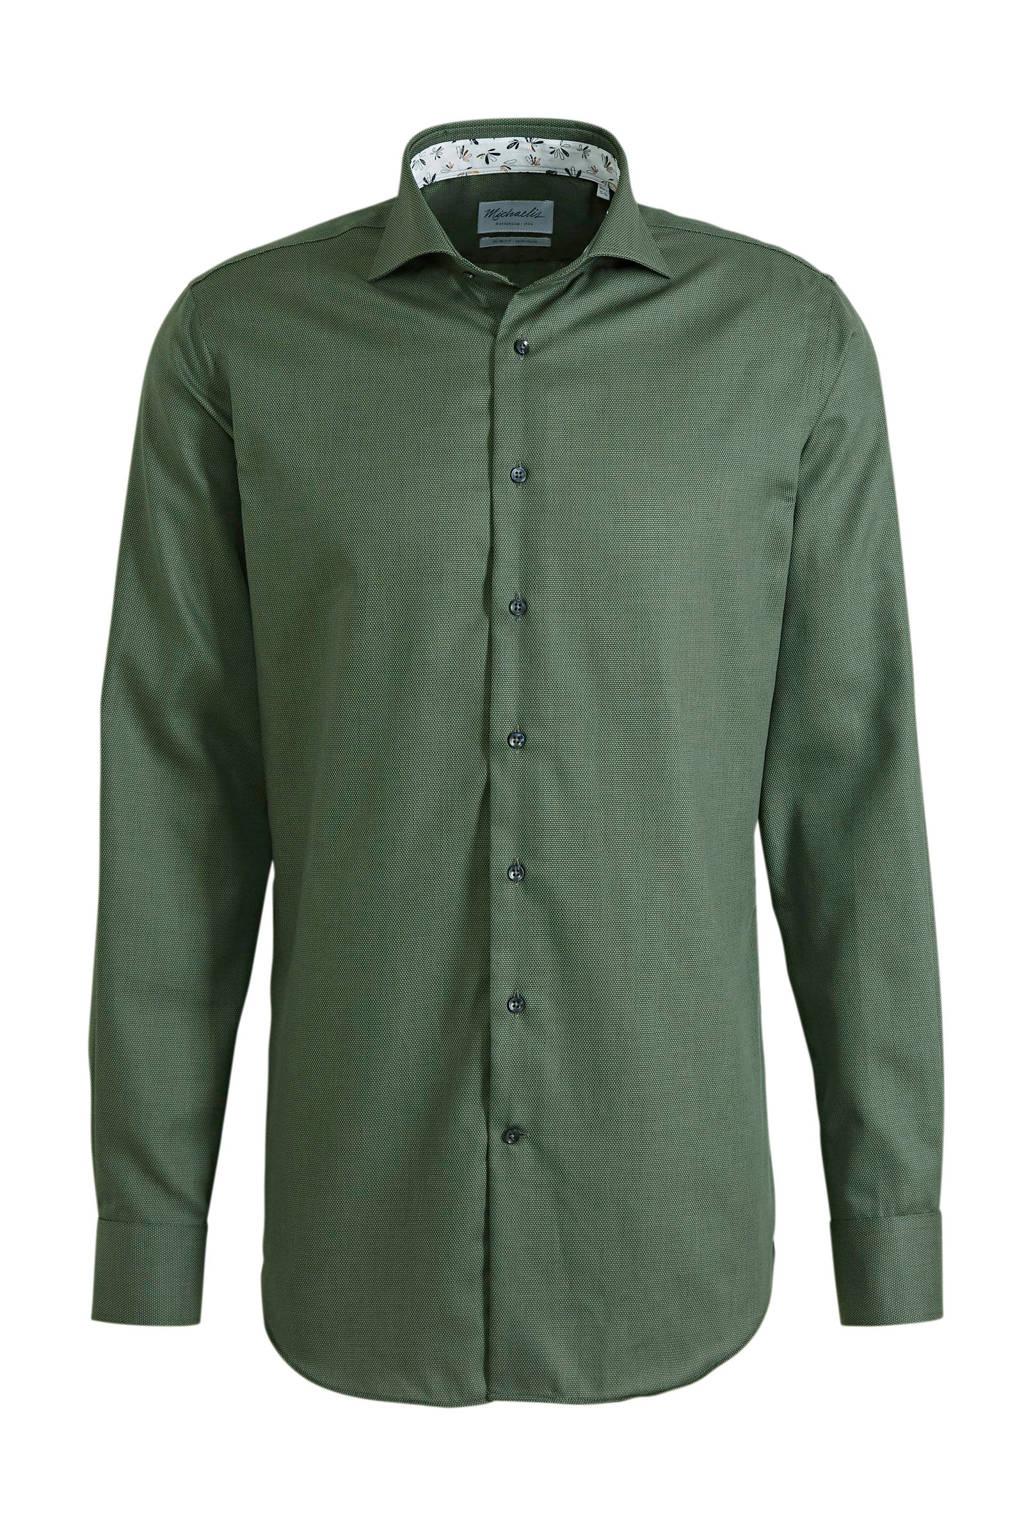 Michaelis gemêleerd slim fit overhemd met mouwlengte 7 groen, Groen